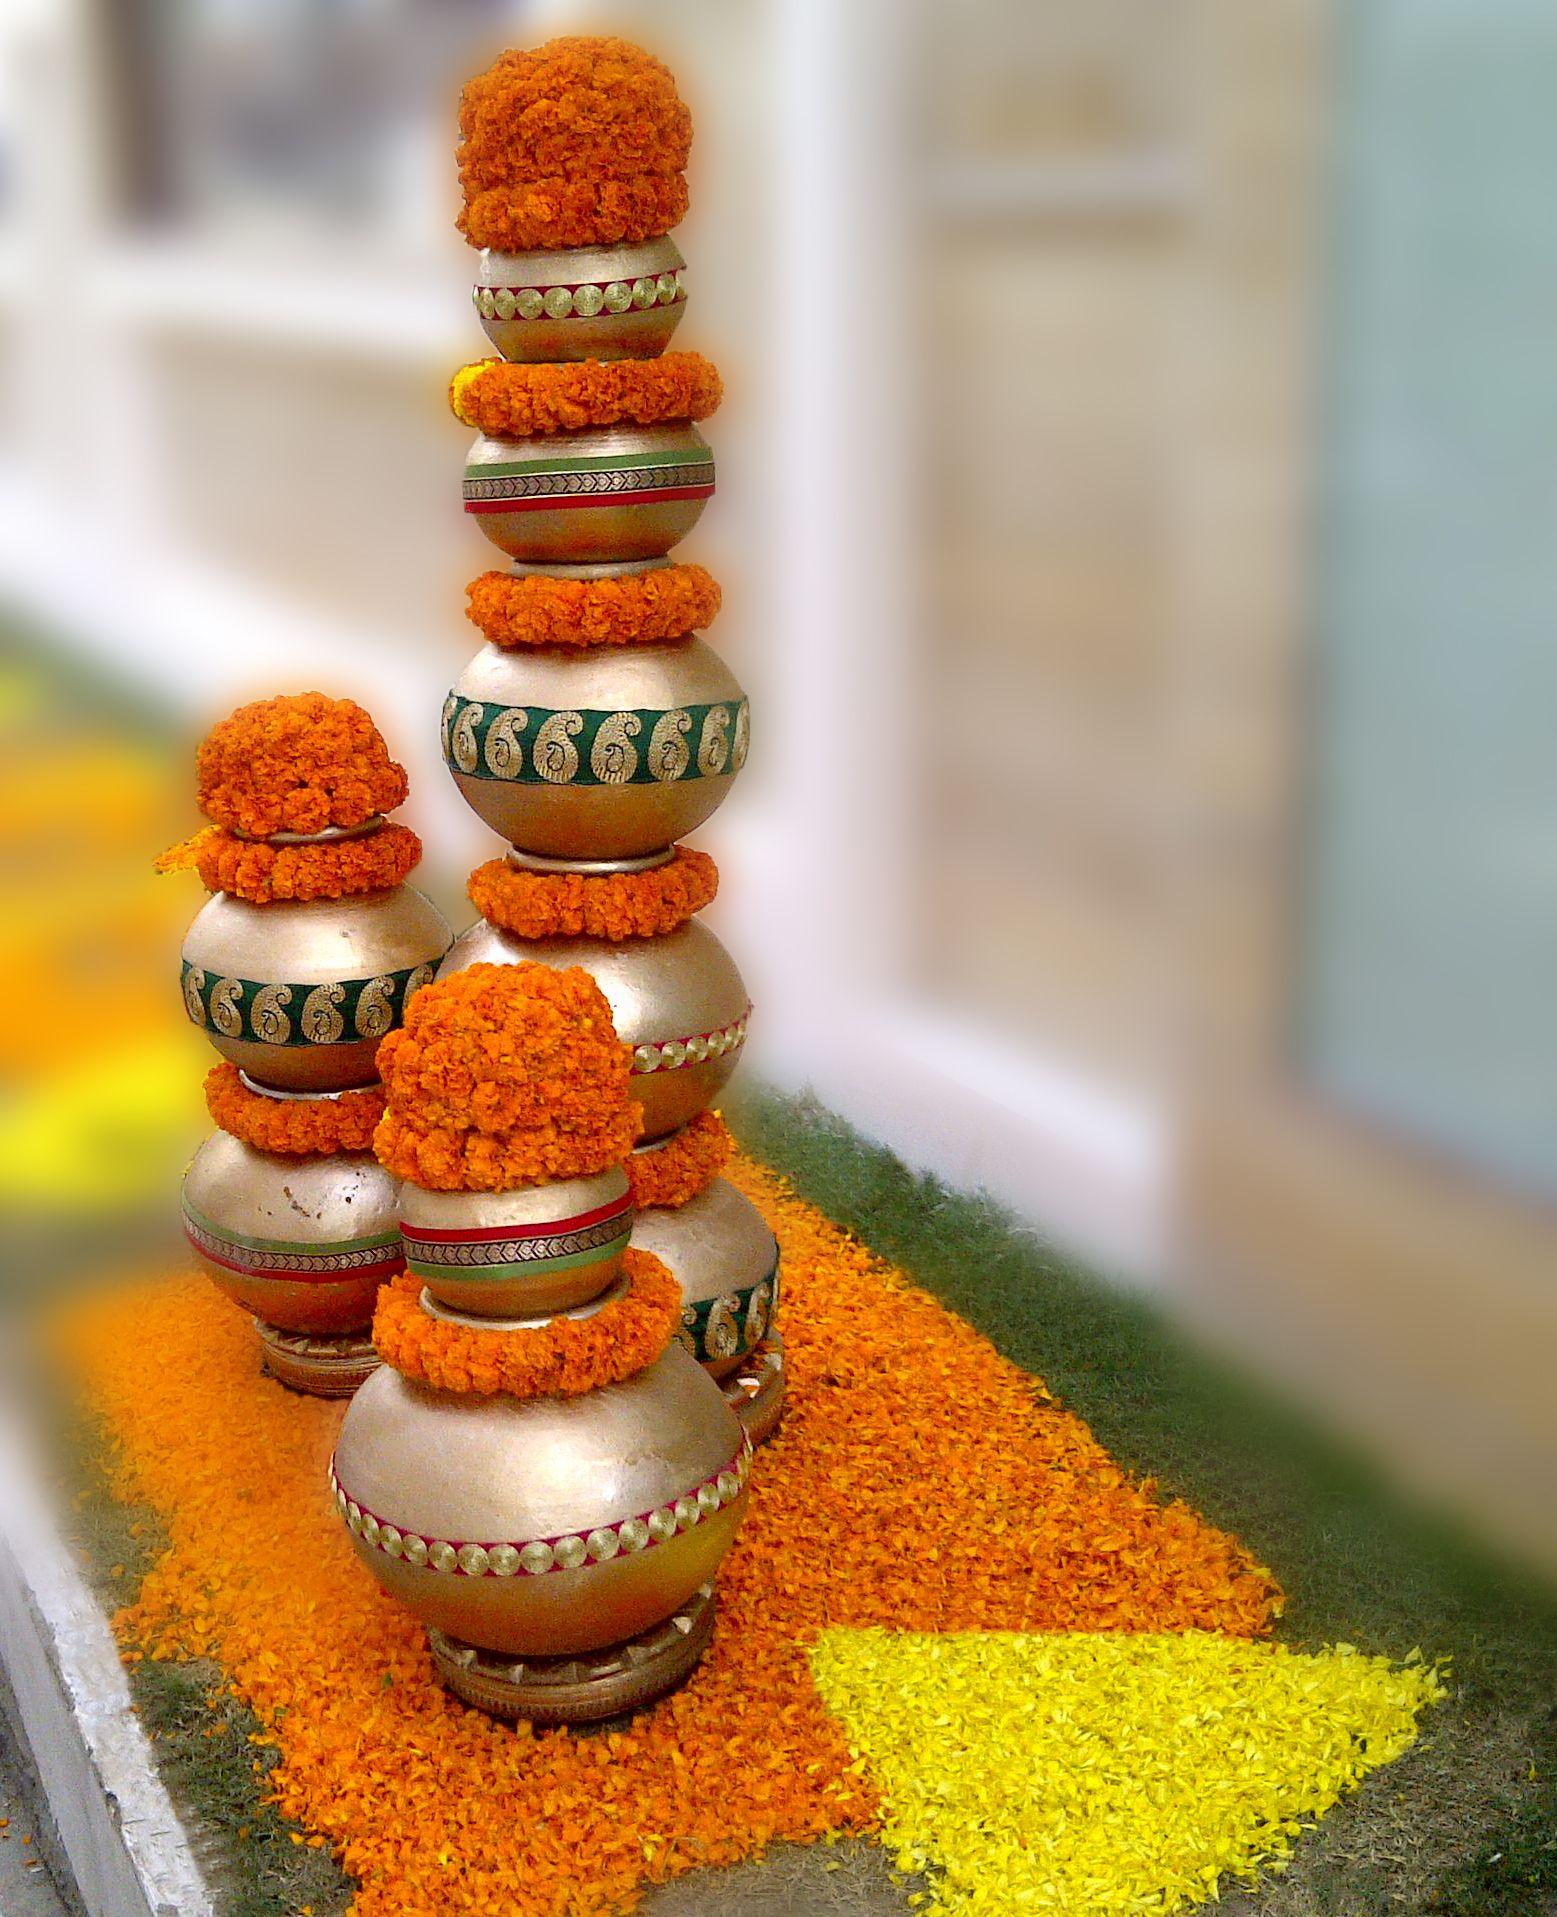 Find great deals on eBay for marigold flowers and dried marigold flowers. Artificial Marigold Flower Garlands Diwali Decoration Indian Wedding Deco Yellow.